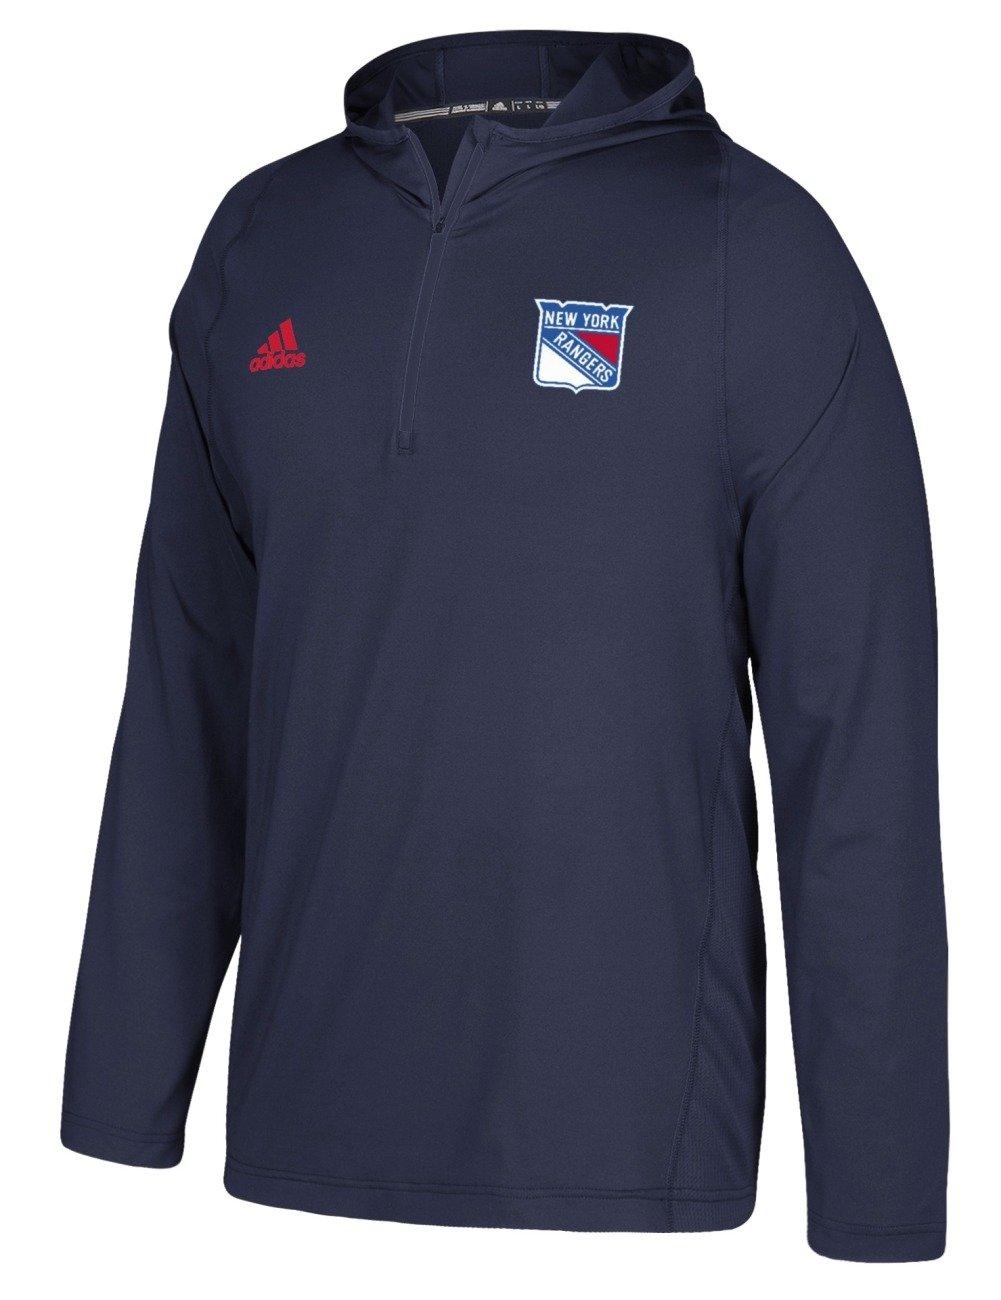 adidas New York Rangers NHL Men's 2017 Authentic Training Hooded Sweatshirt